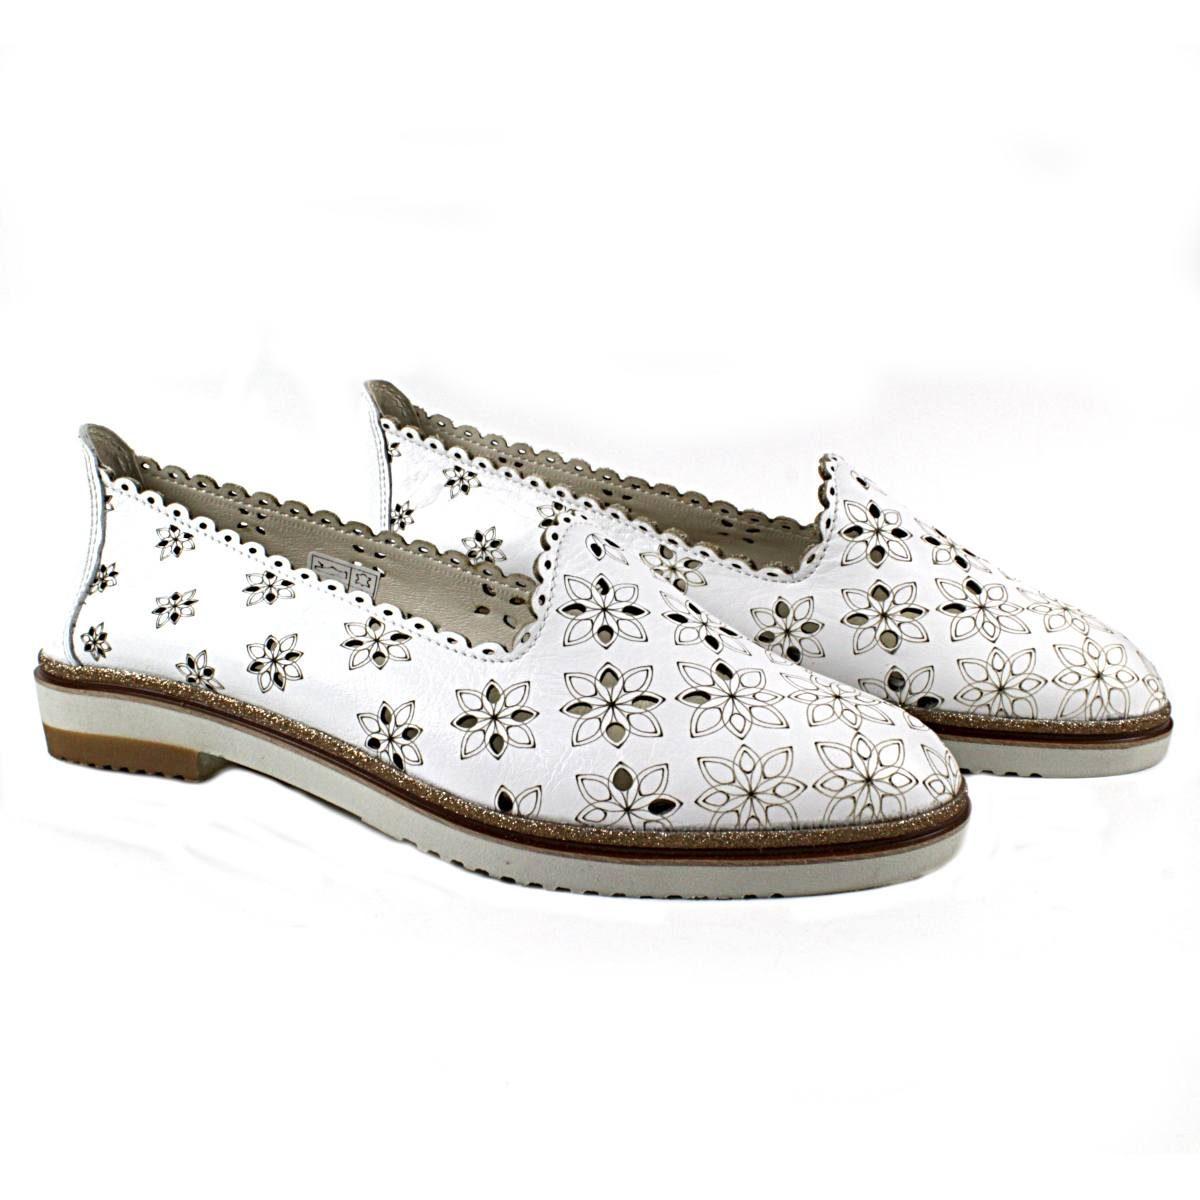 Бели Летни Дамски Обувки Естествена Кожа на Цветя Двете